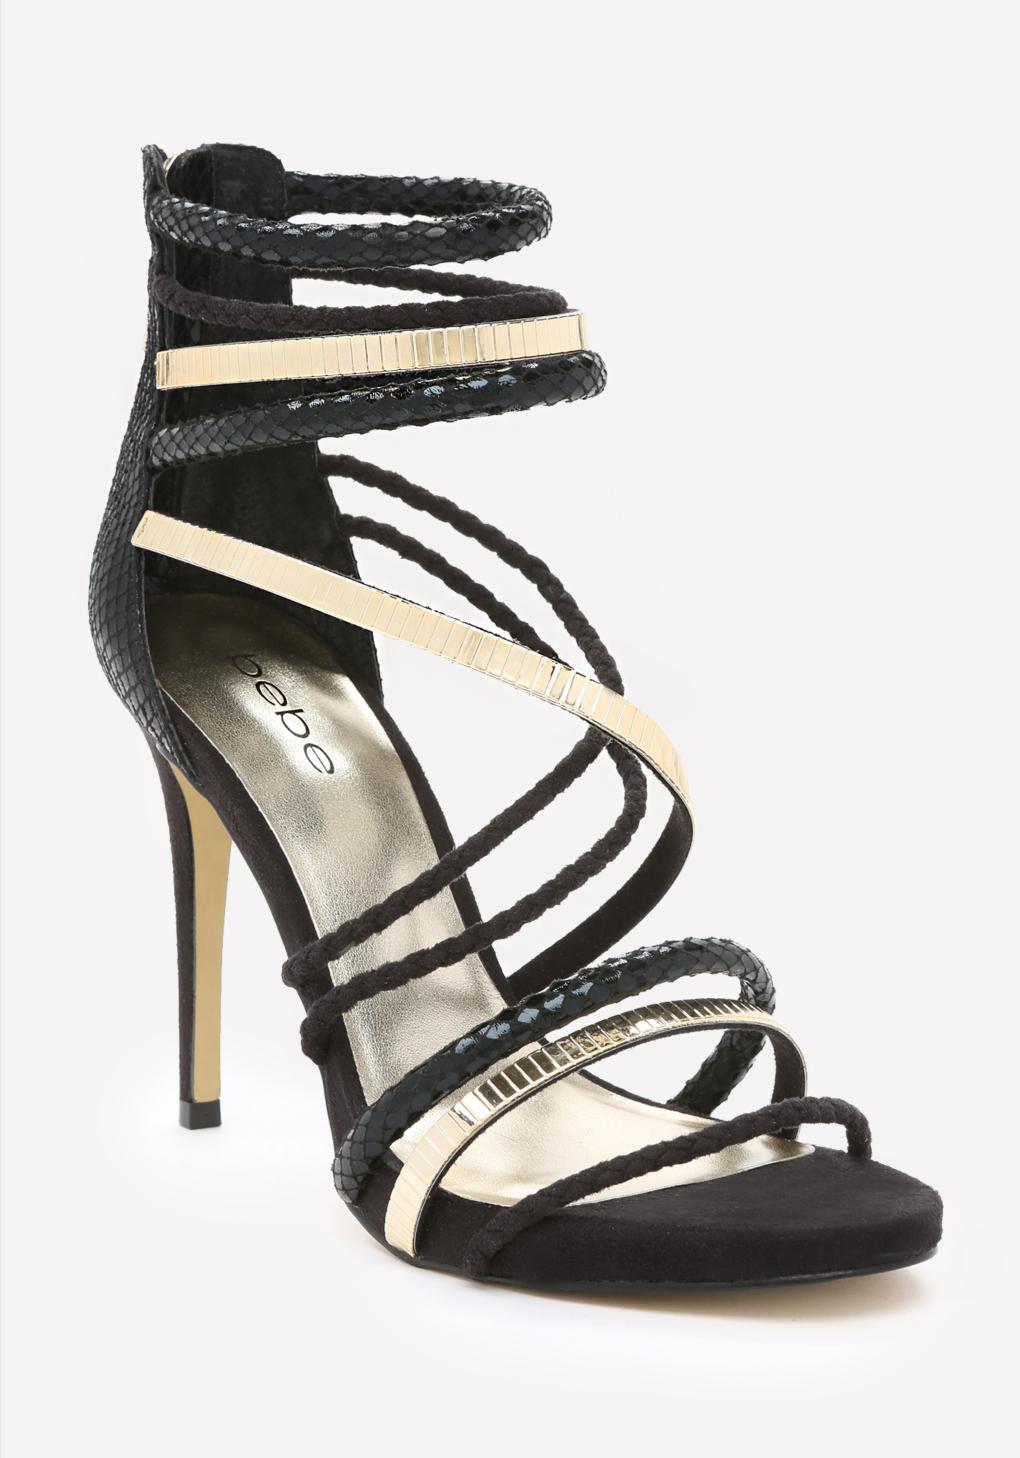 ca66866d80a Lyst - Bebe Nedda Strappy Sandals in Metallic